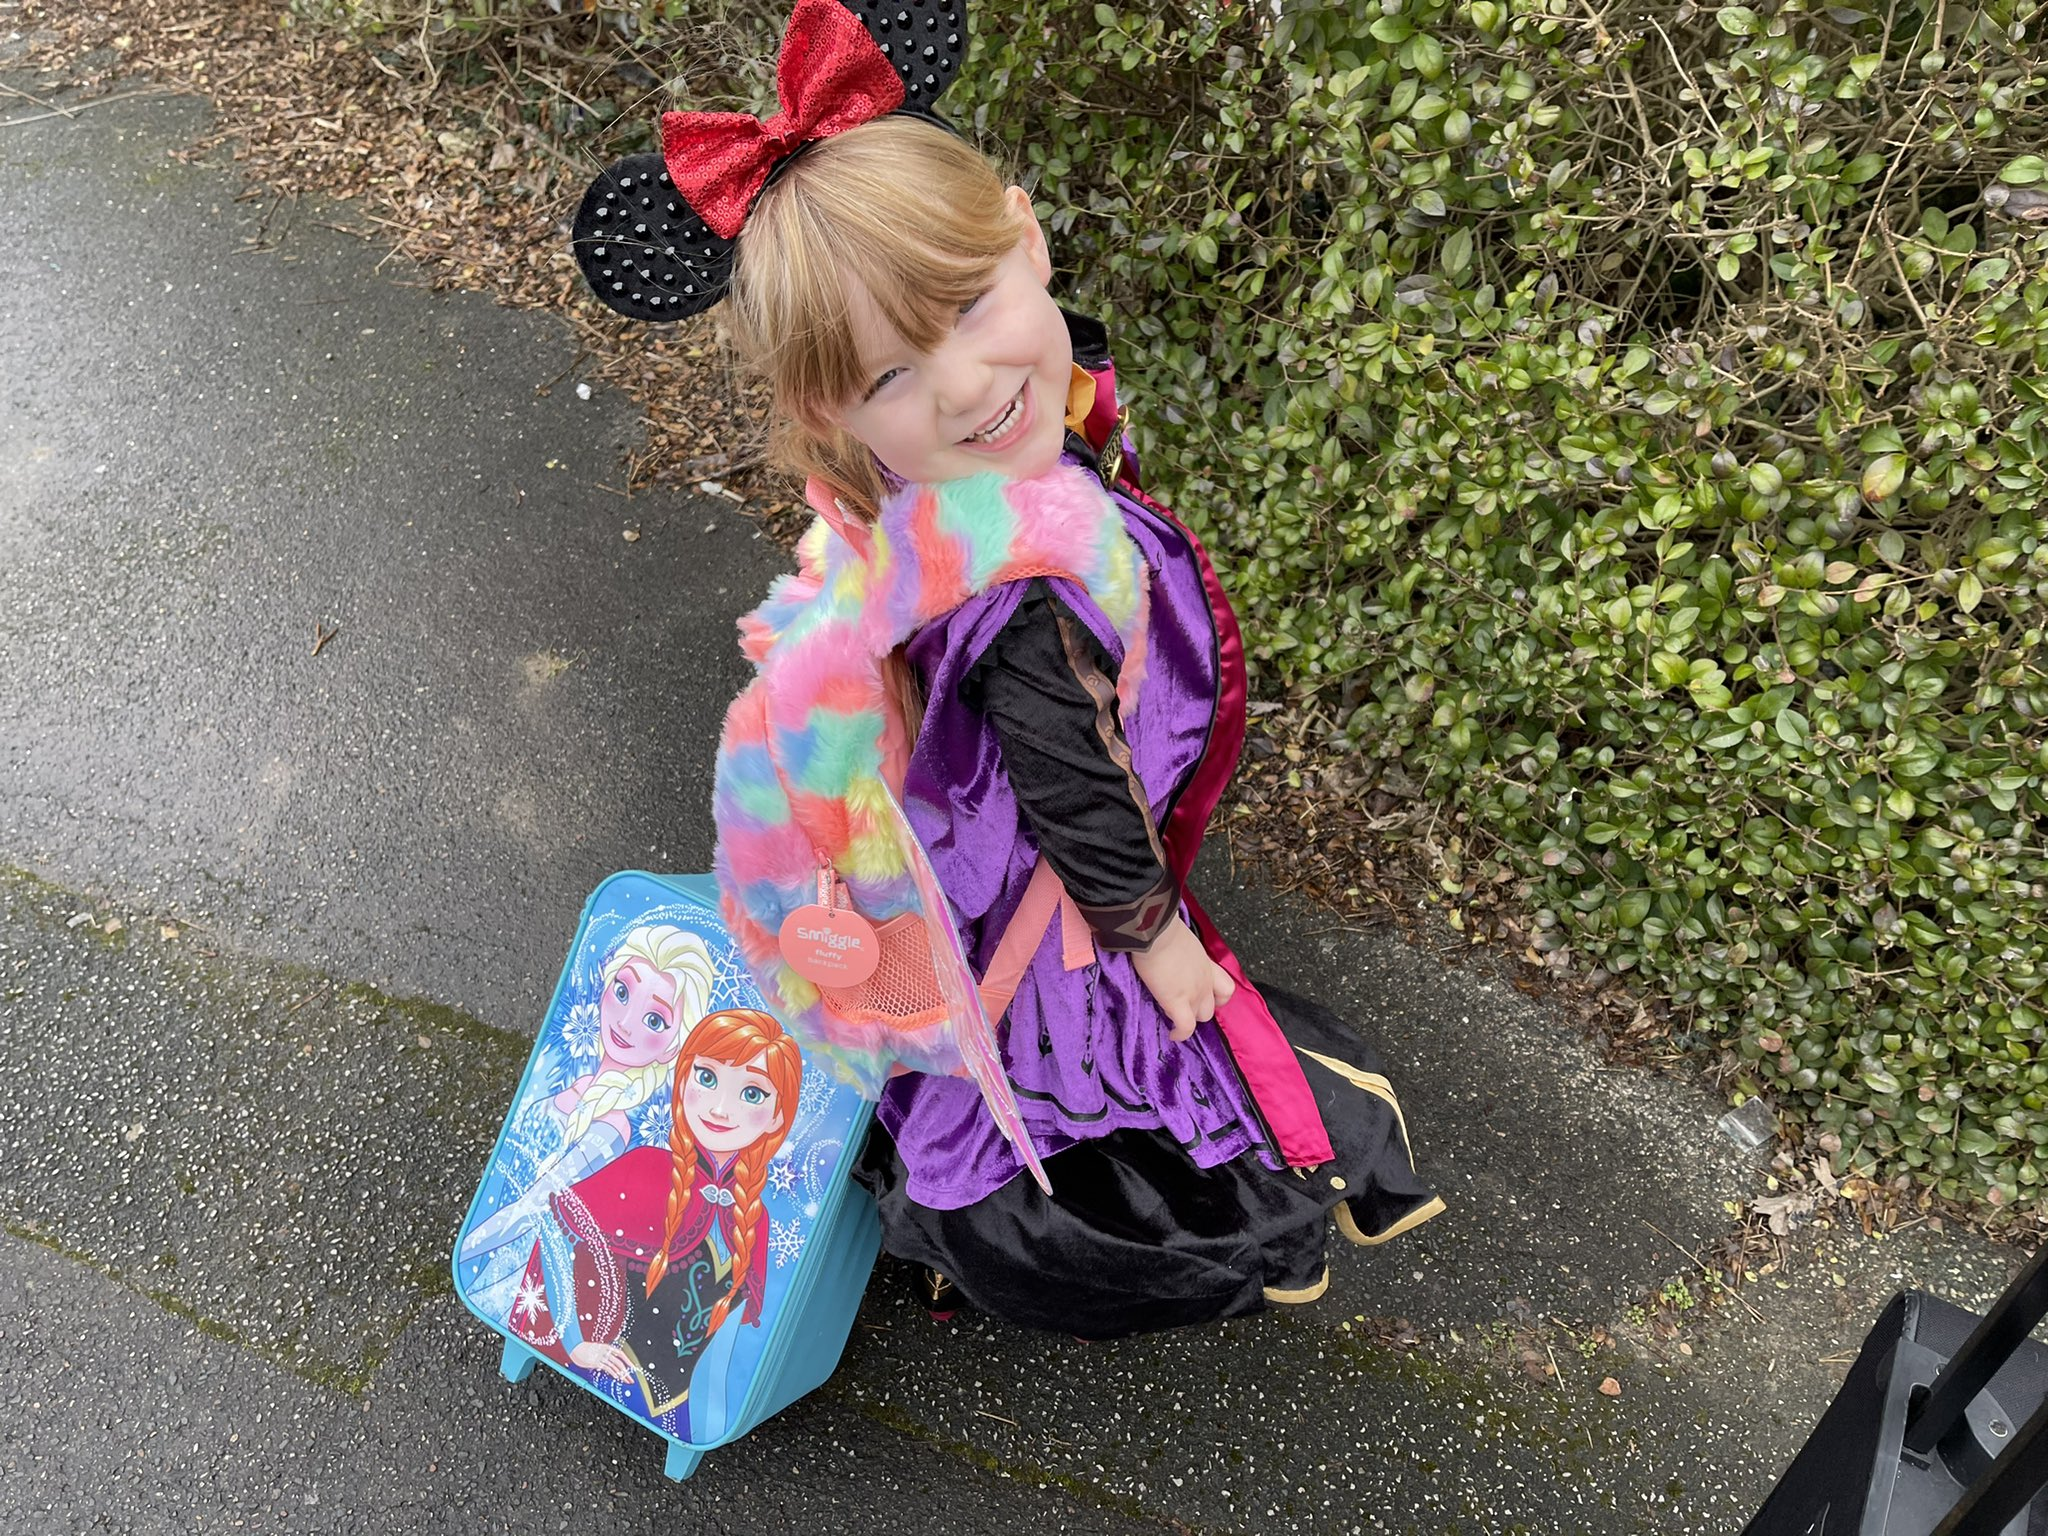 Scarlett Hodgson on her walk tot the 'airport'